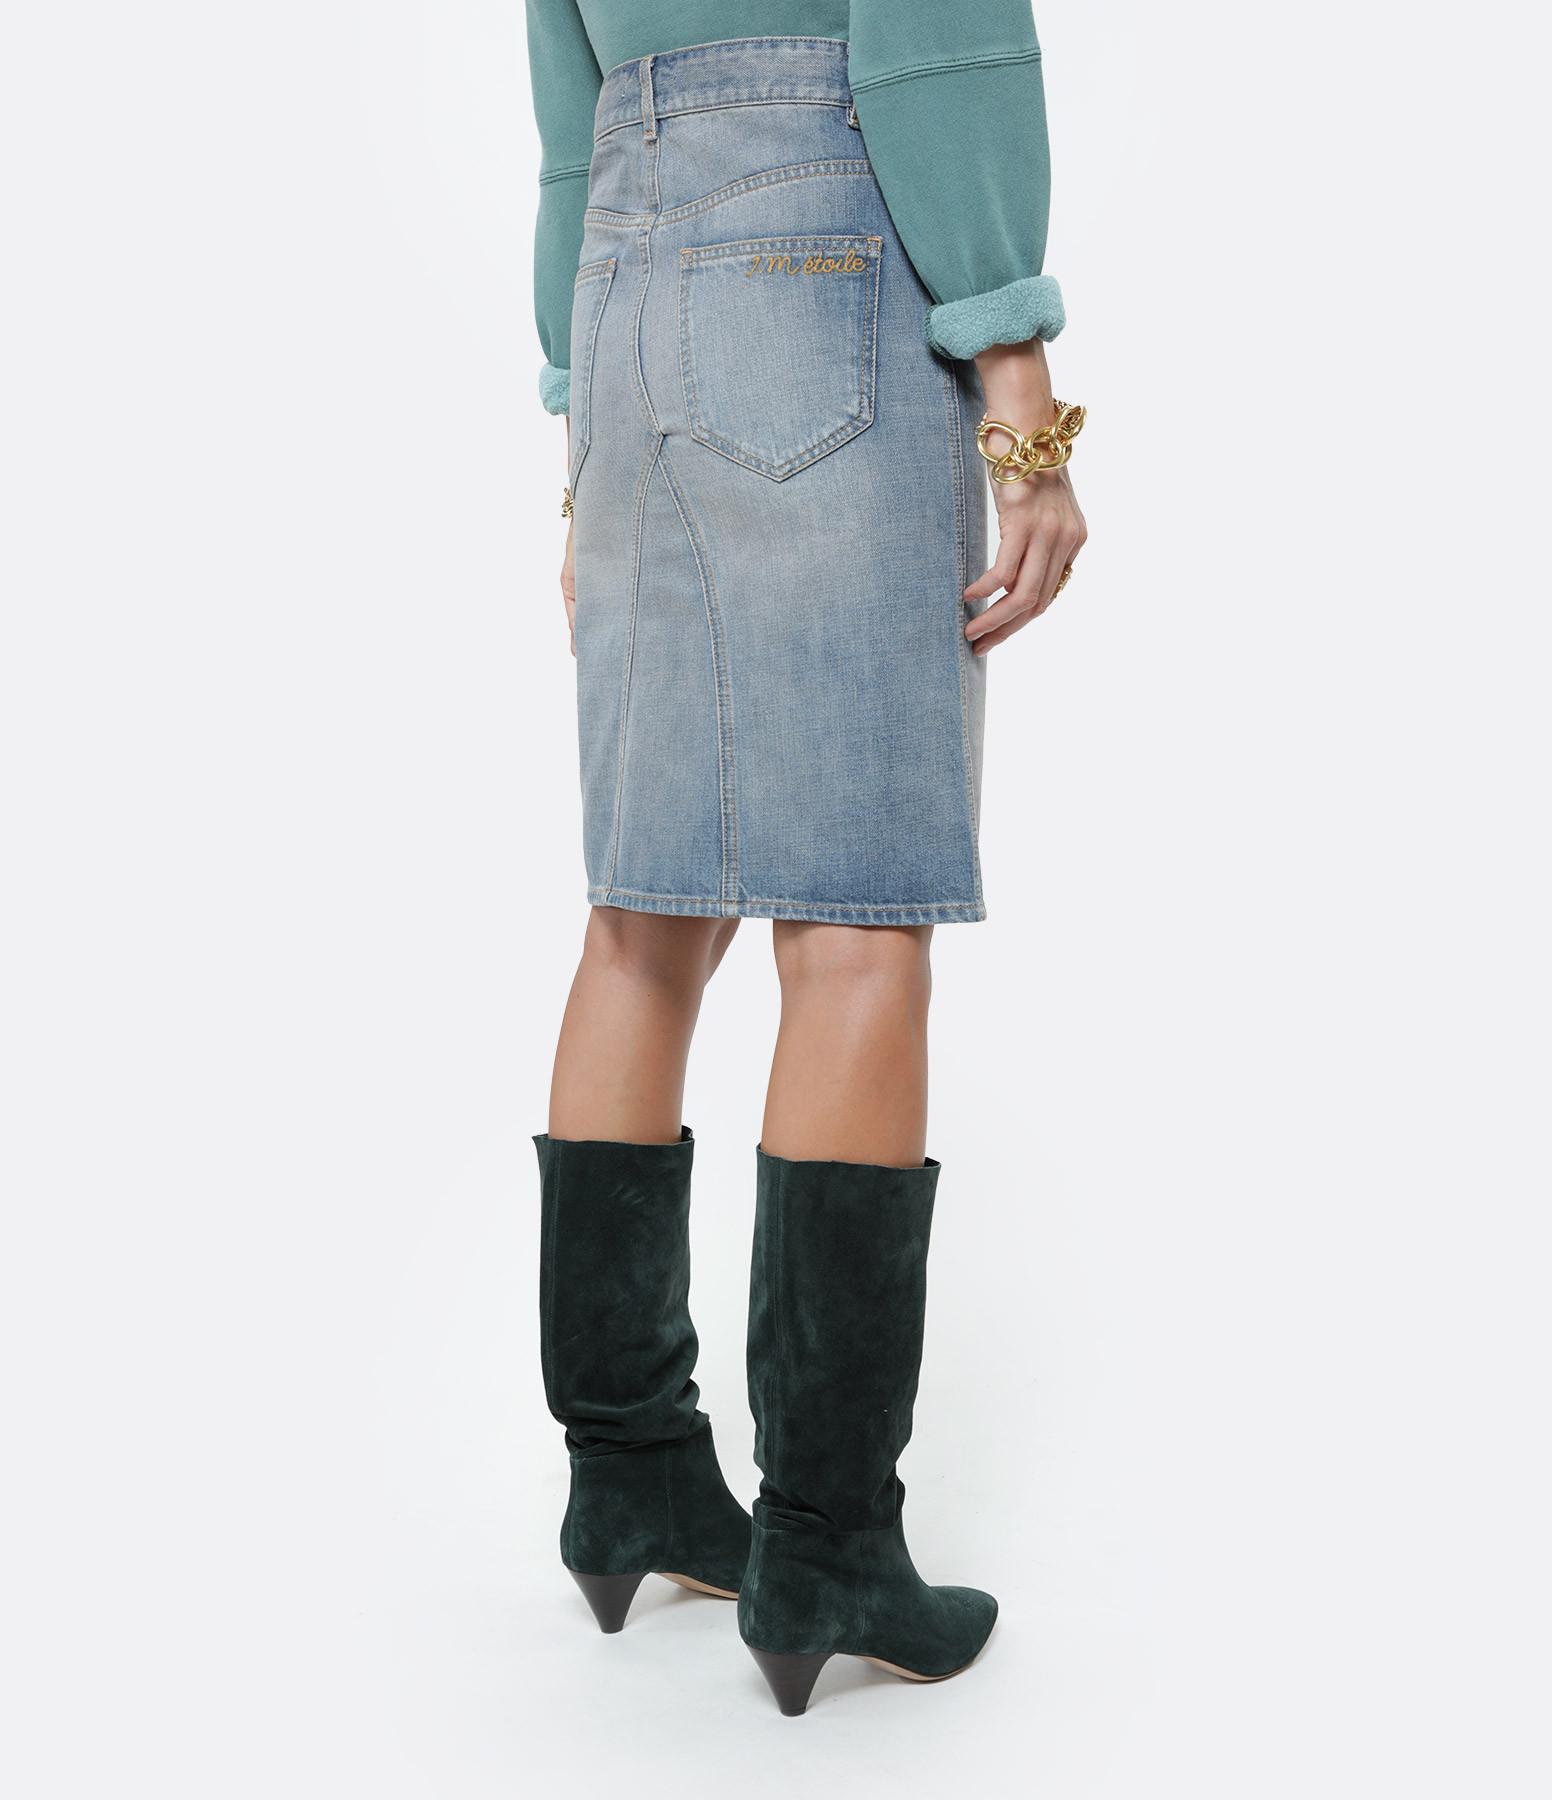 ISABEL MARANT ÉTOILE - Jupe Fiali Bleu